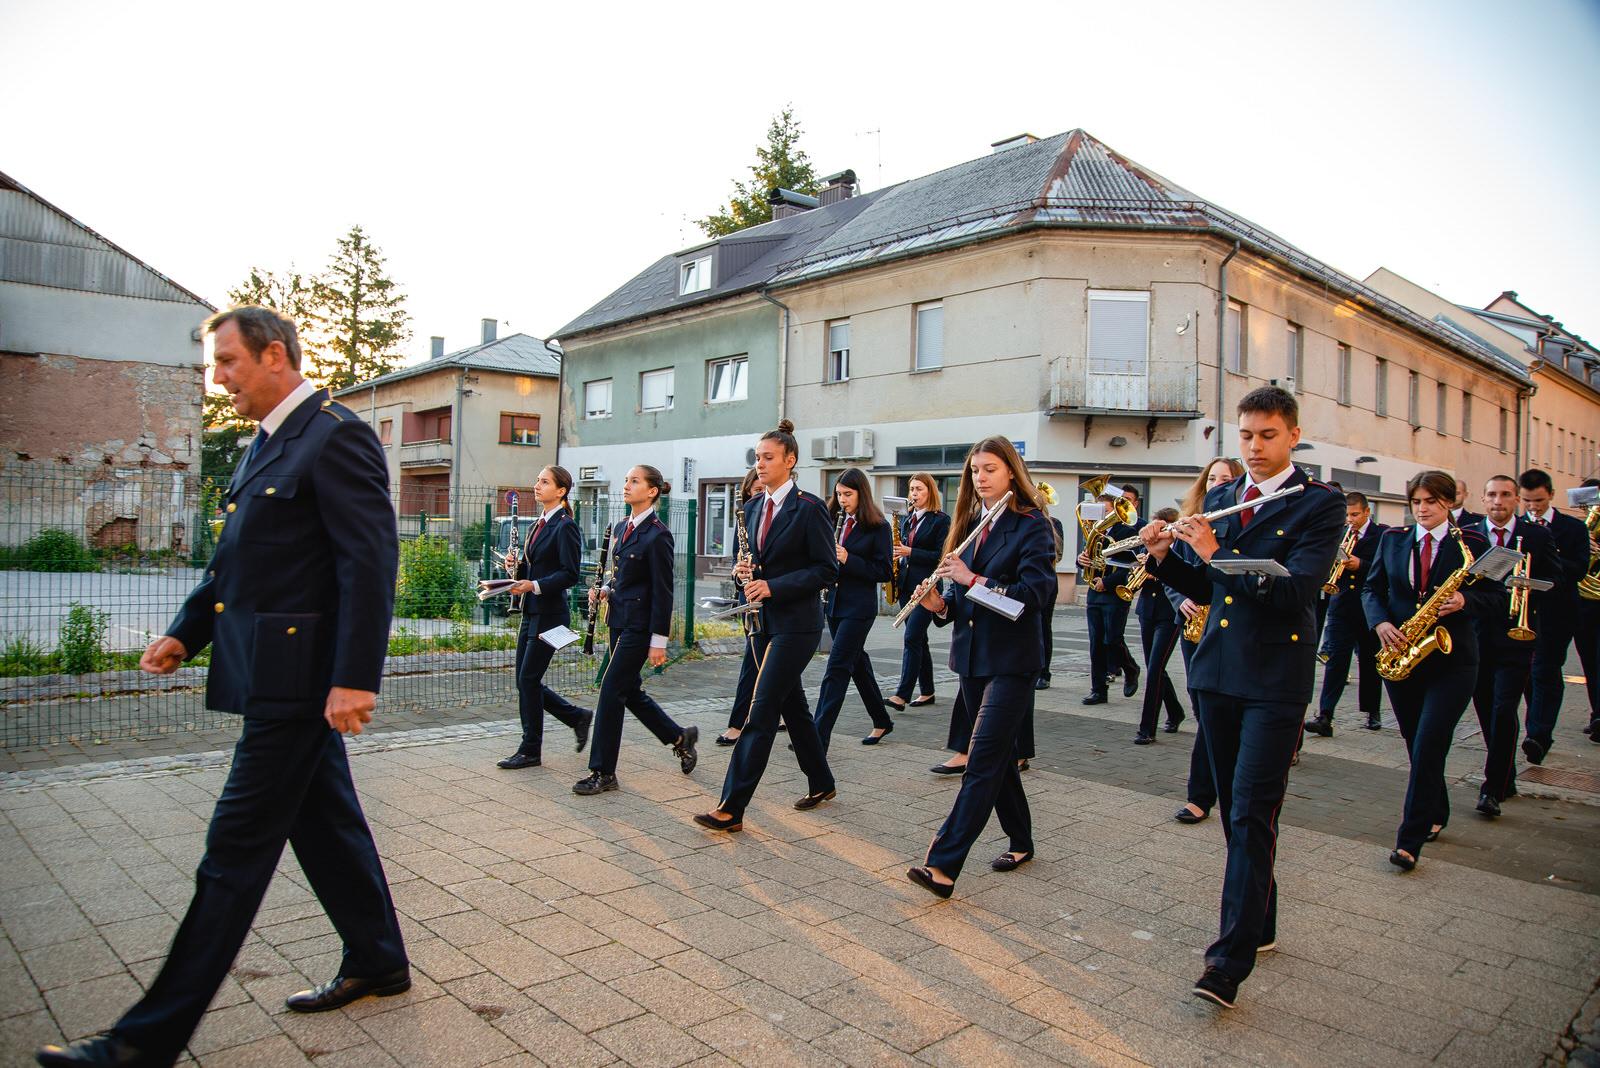 likaclub_budnica puhačkog orkestra povodom dana grada_22_7_2020 (30)